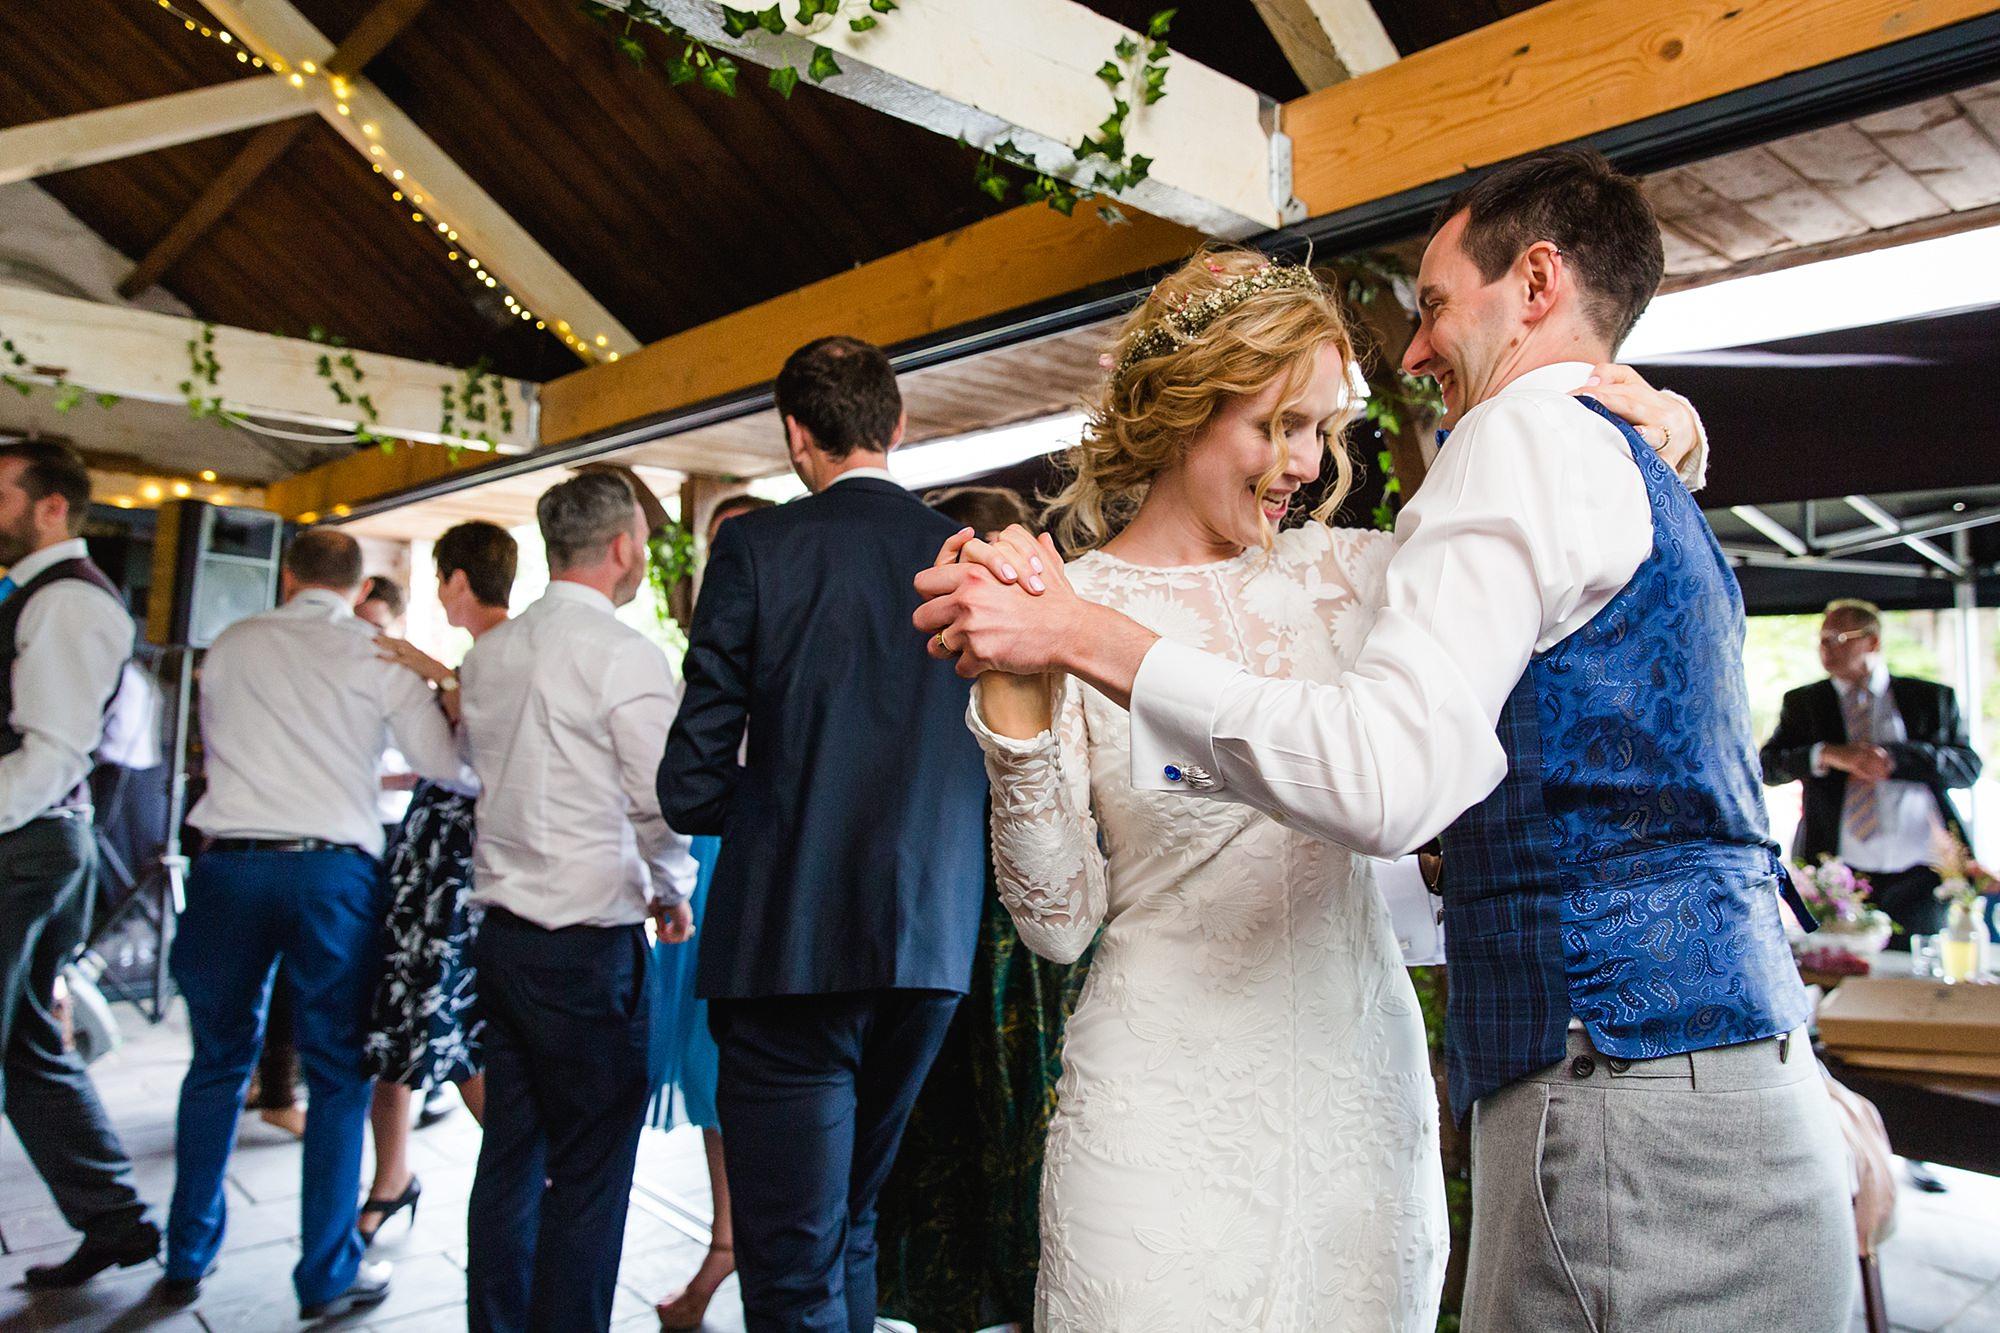 Isis Farmhouse Oxford Wedding bride and groom dance in a ceilidh